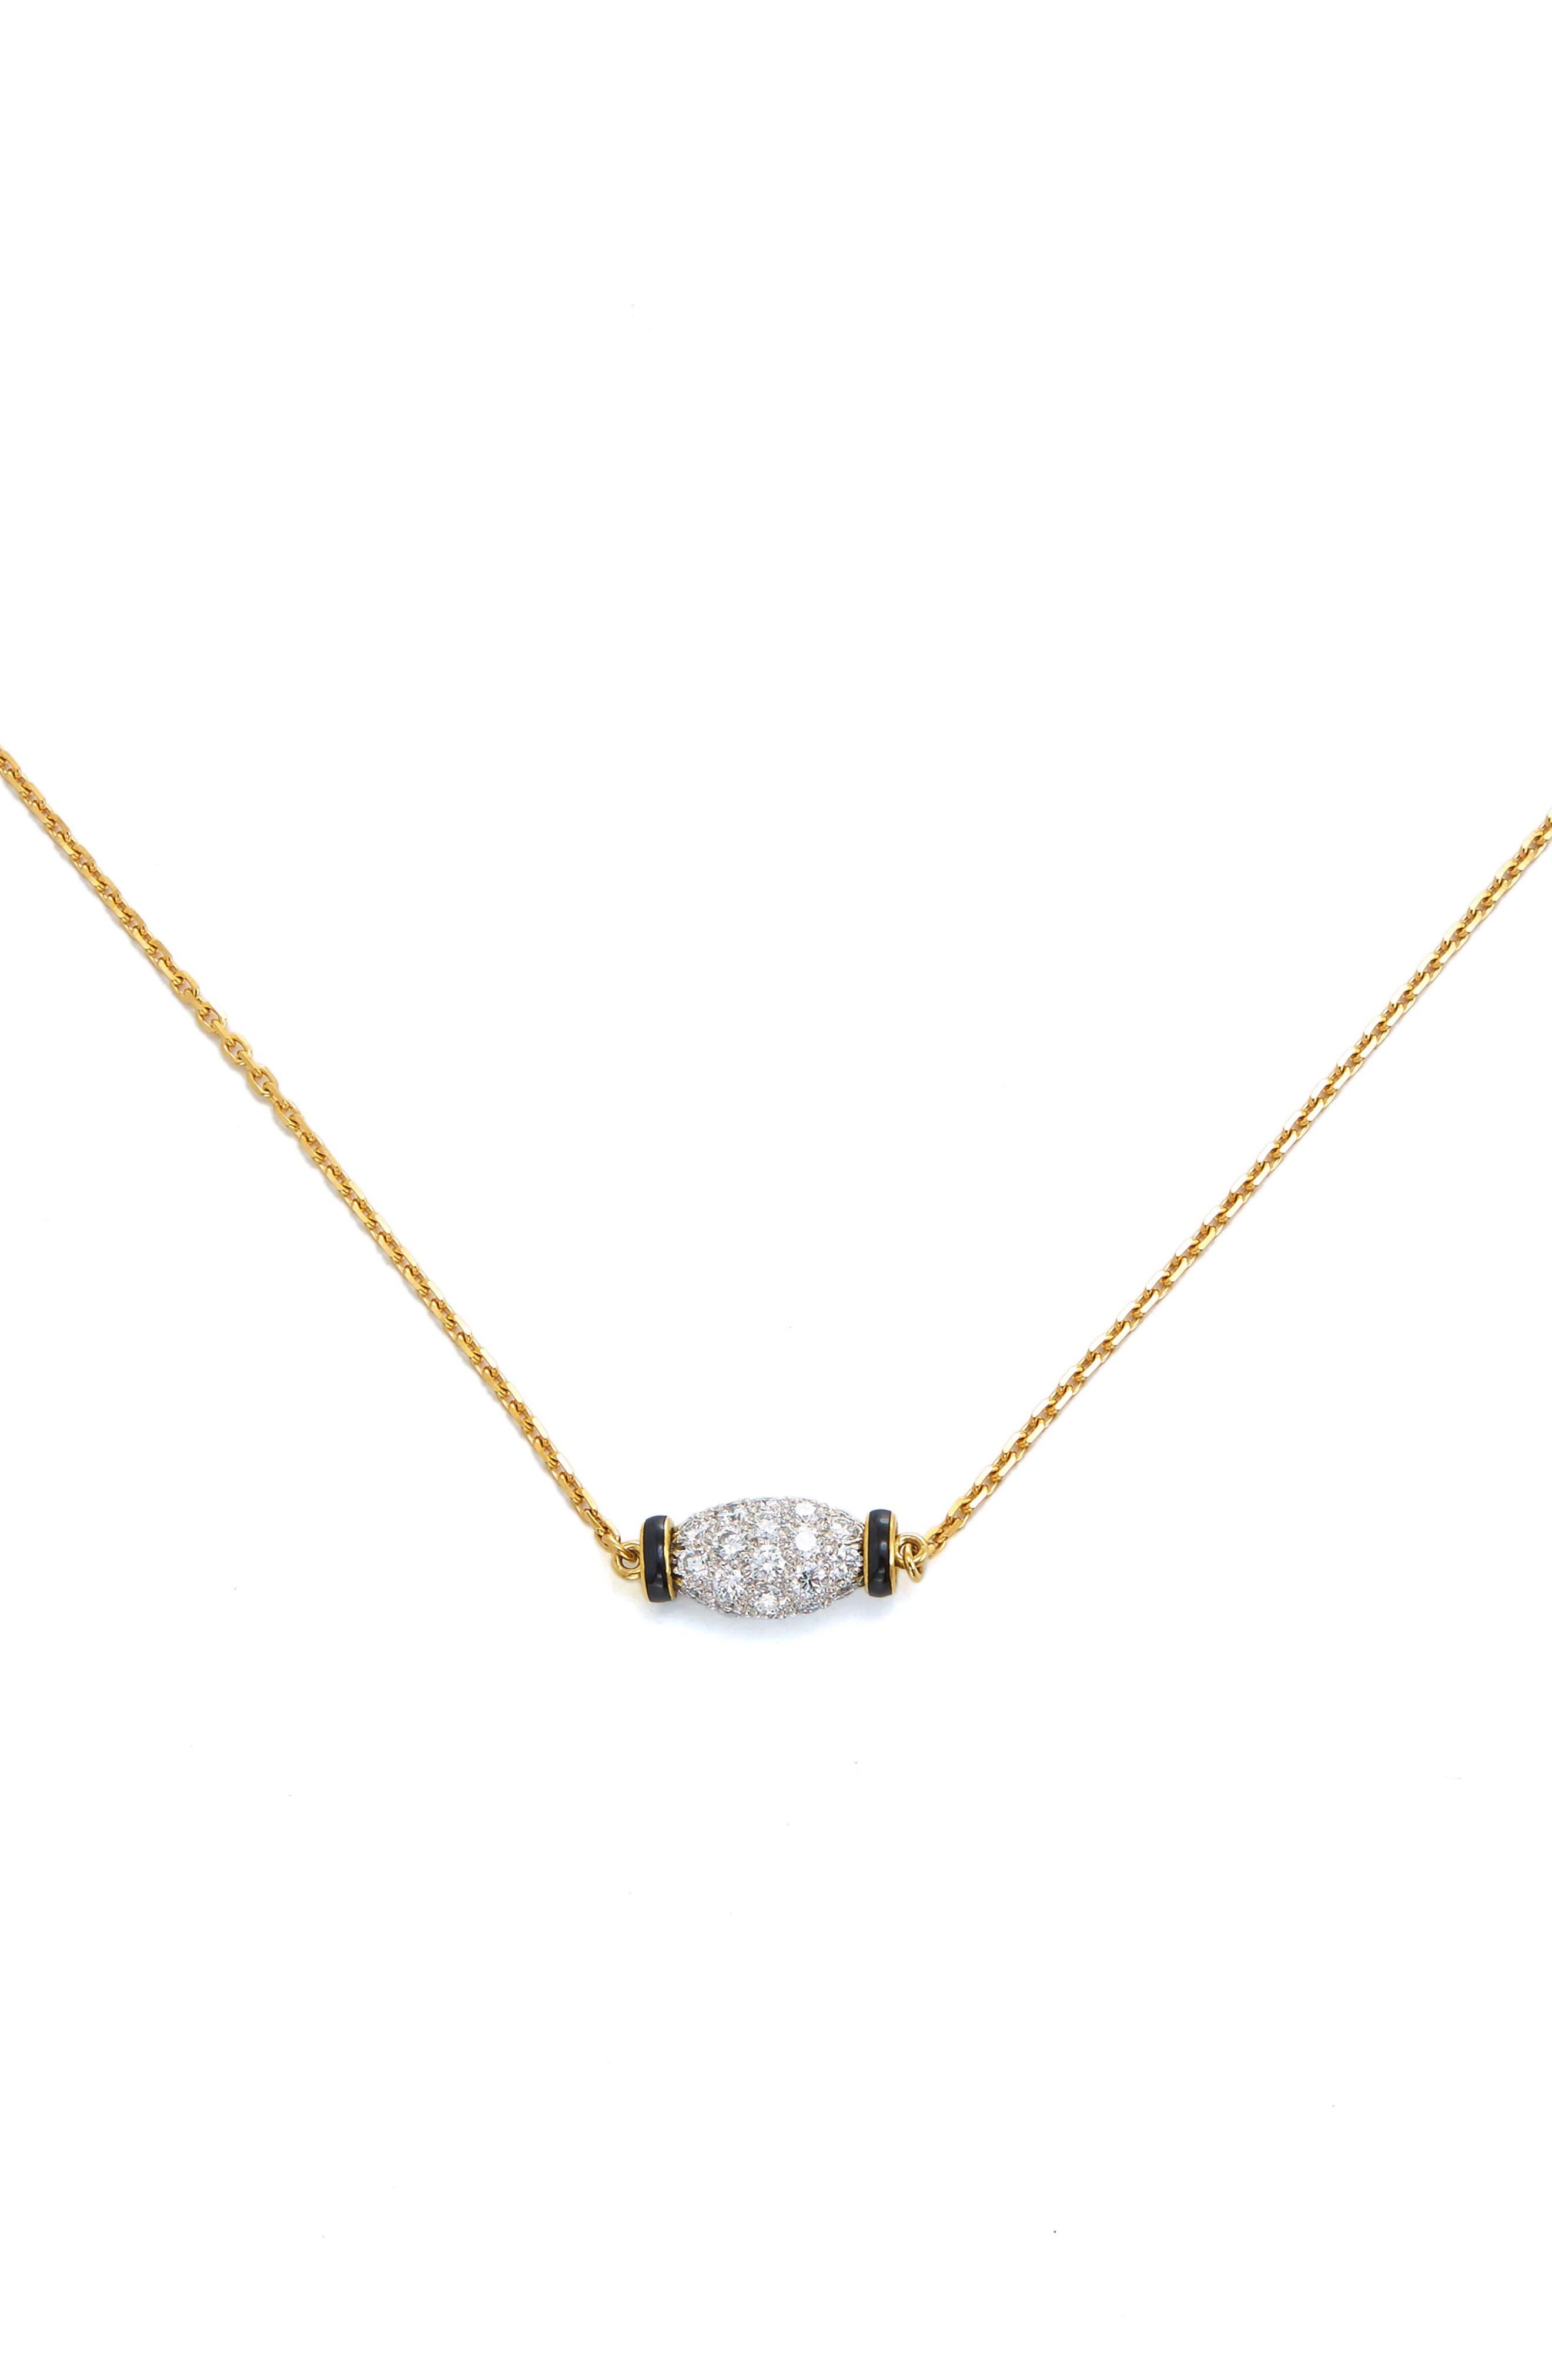 Motif Night Cap Pendant Necklace